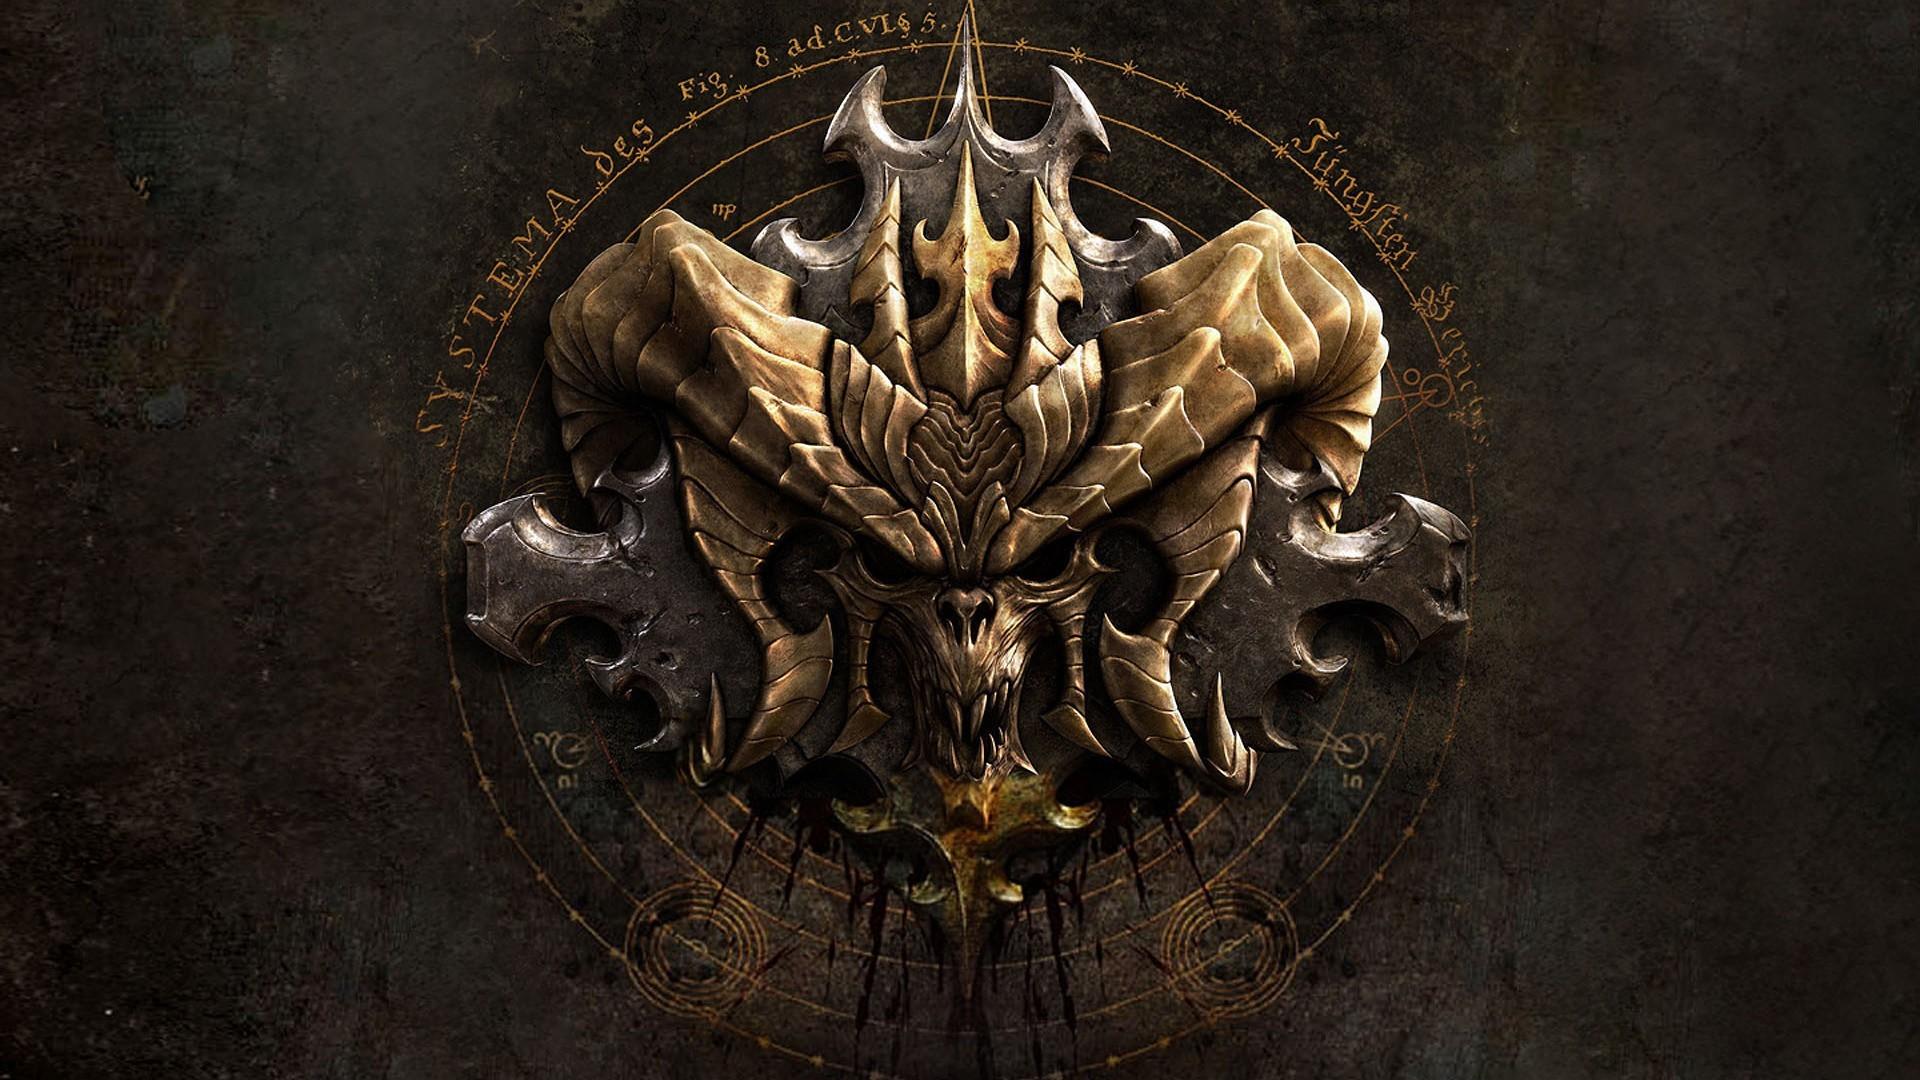 Diablo III  № 1896324 бесплатно